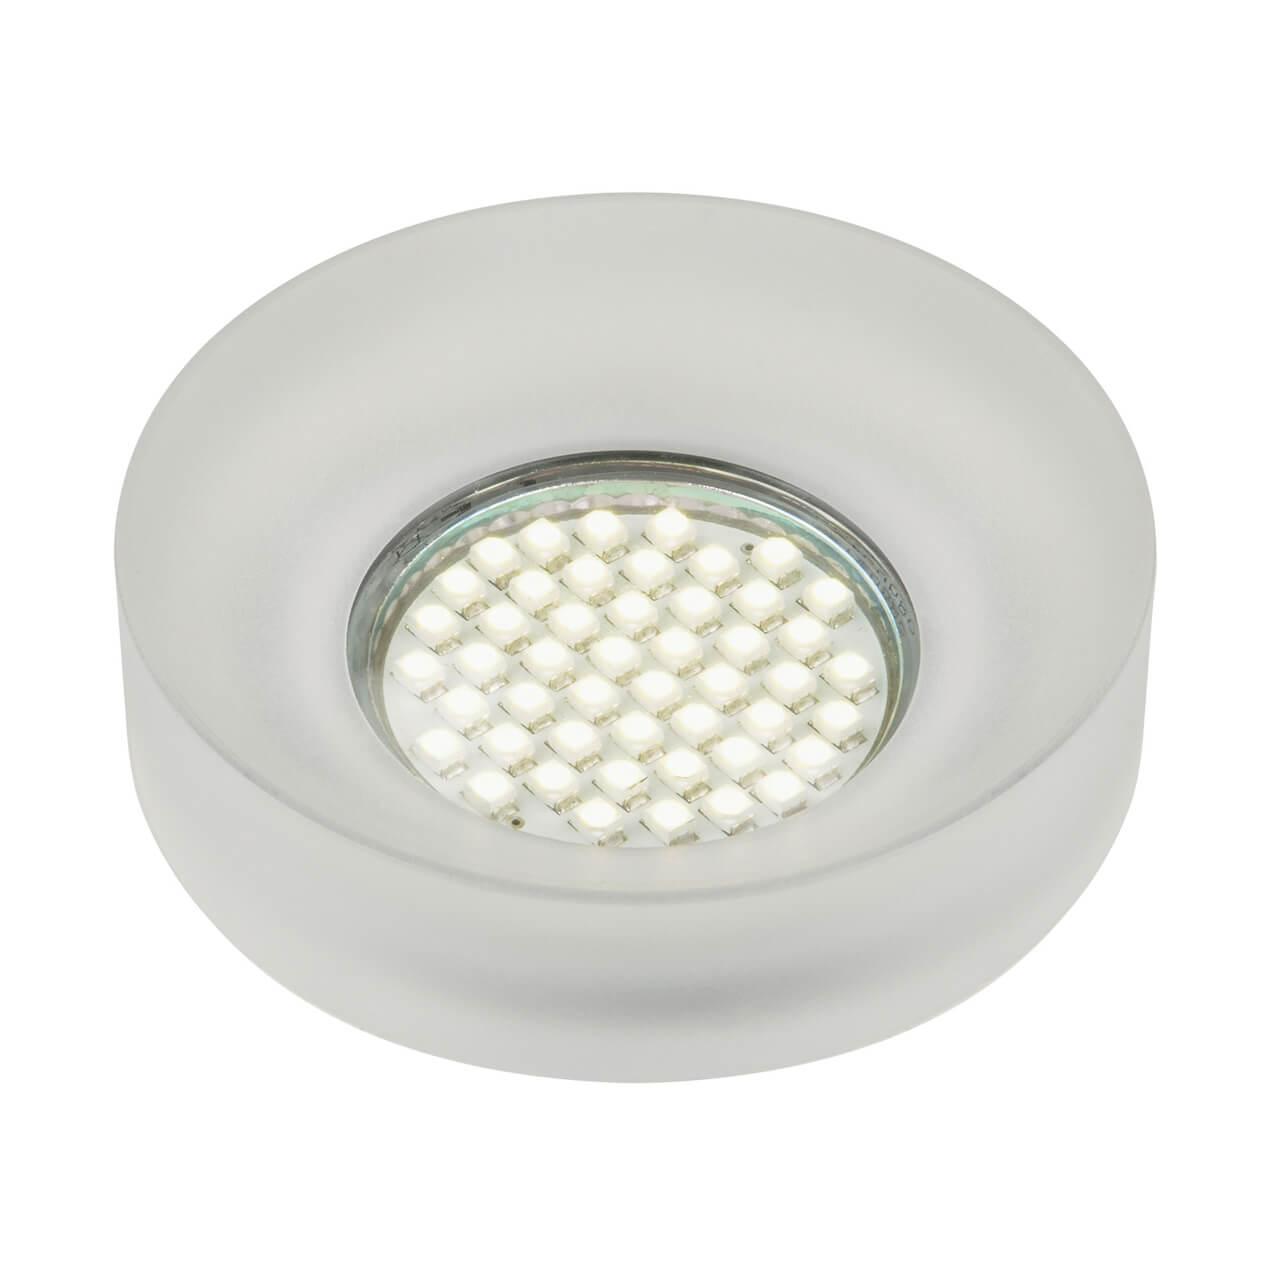 Встраиваемый светильник Fametto Nuvola DLS-N101 GU10 white/mat штатив deluxe dls 100b black white